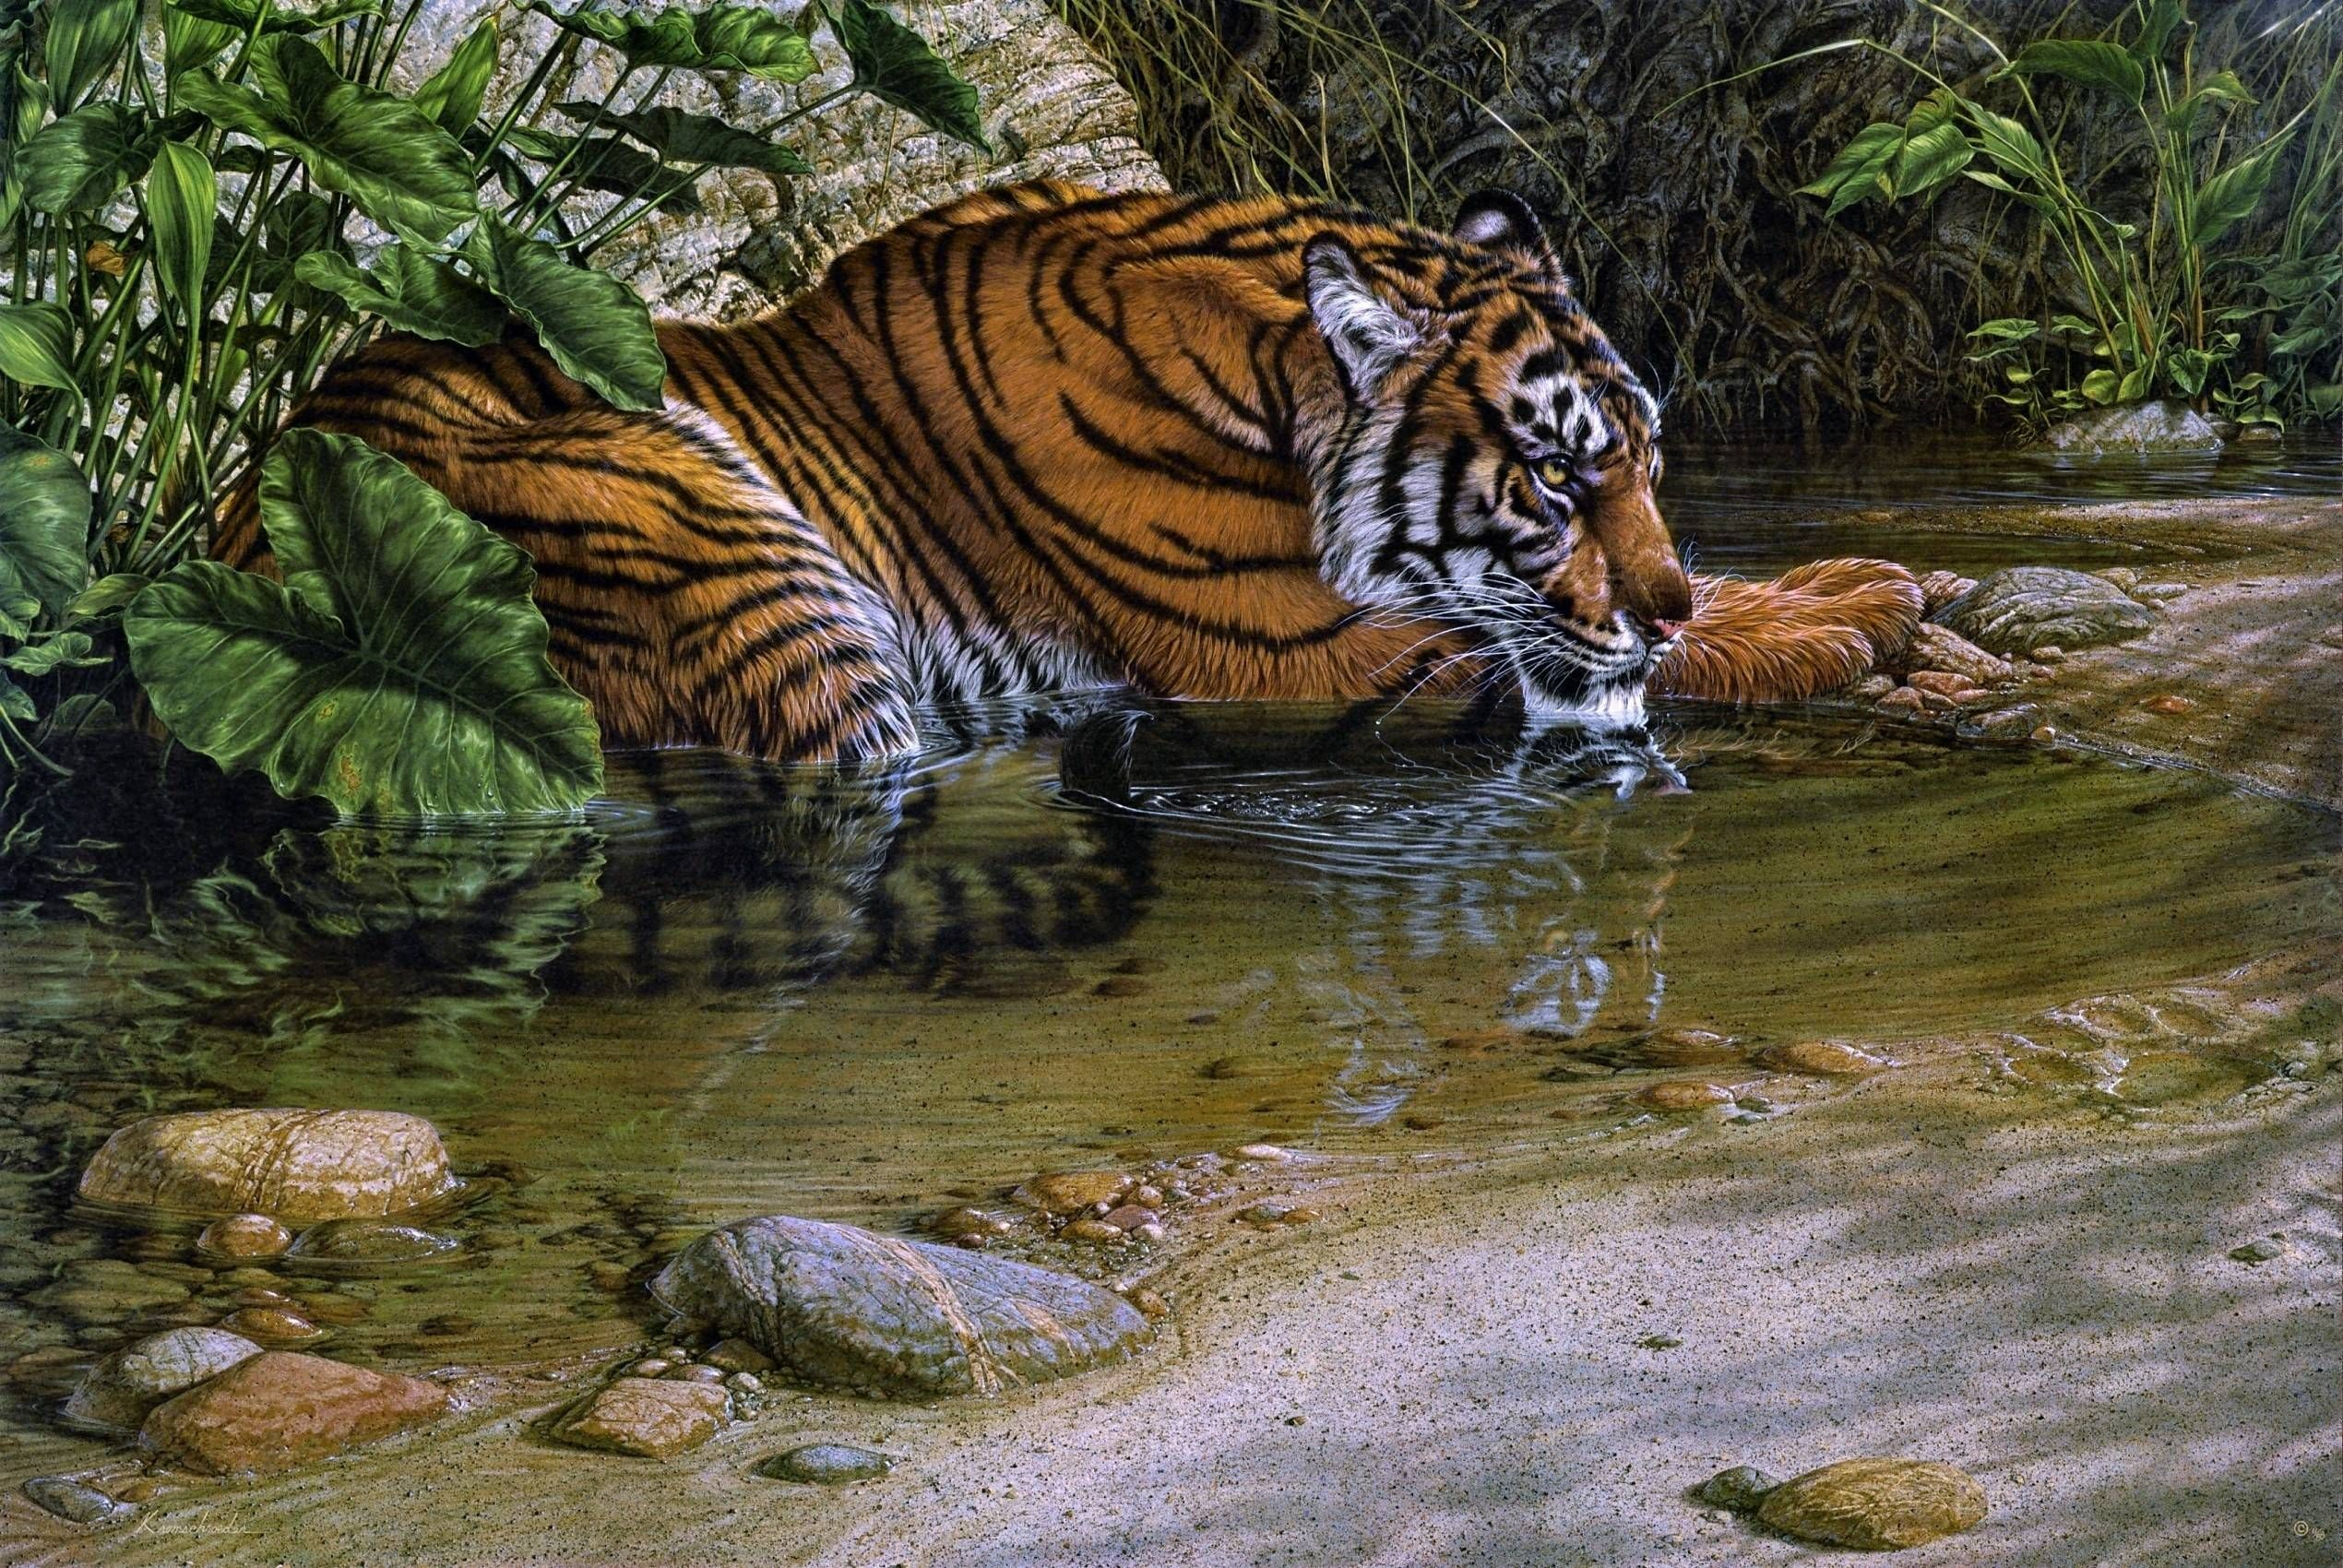 Hd wallpaper jungle - Jungle Animals Real Life Hd Wallpapers